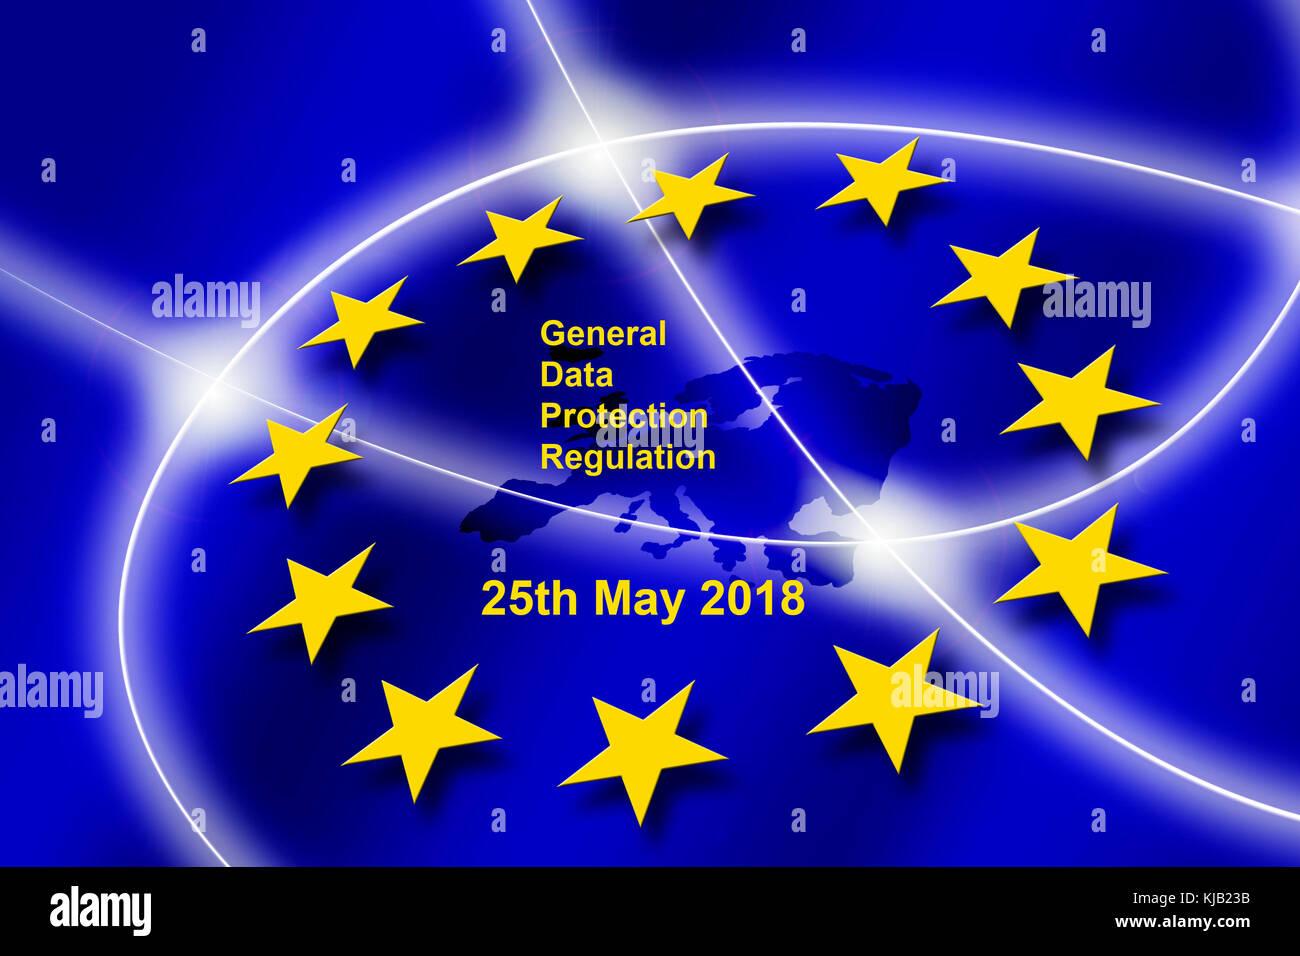 General Data Protection Regulation - Stock Image